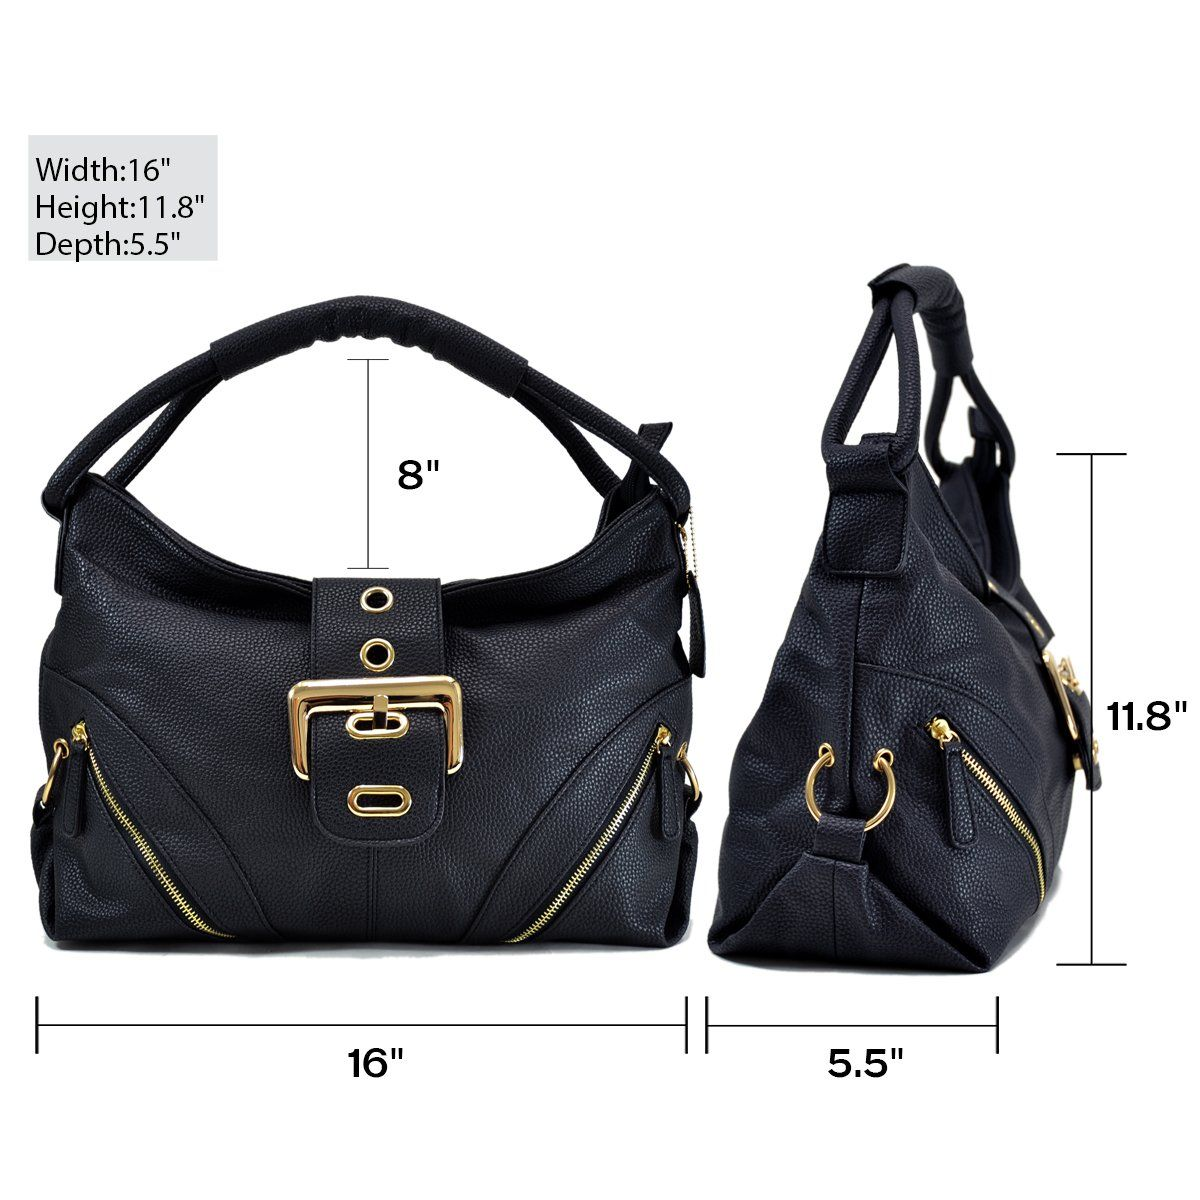 ebcd420a0f453 MKP Collection Fashion Hobo bag.Designer handbag.Multicolor choose.Tote for  woman.